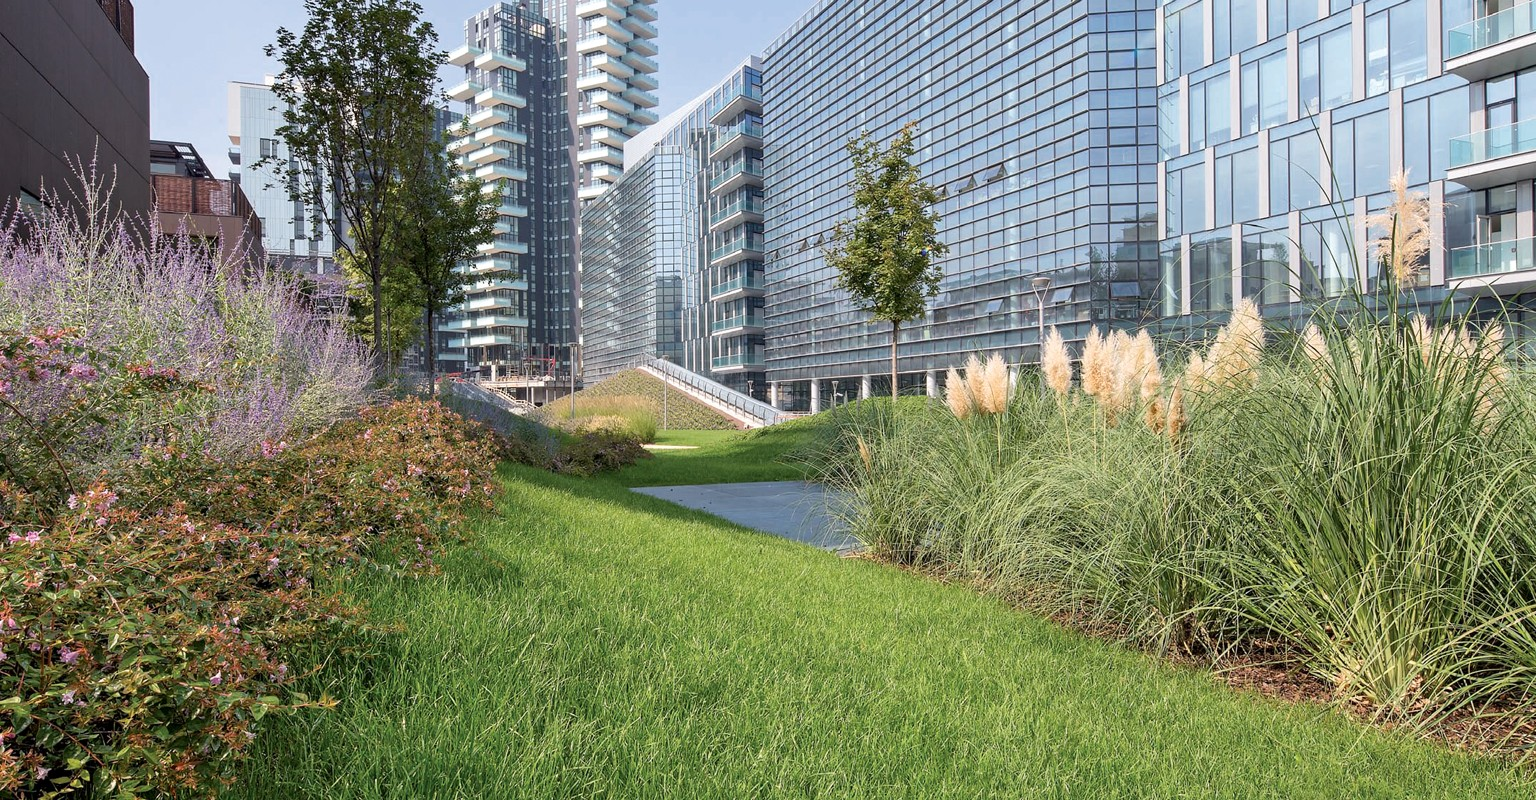 Studio Architettura Paesaggio Milano land | linkedin